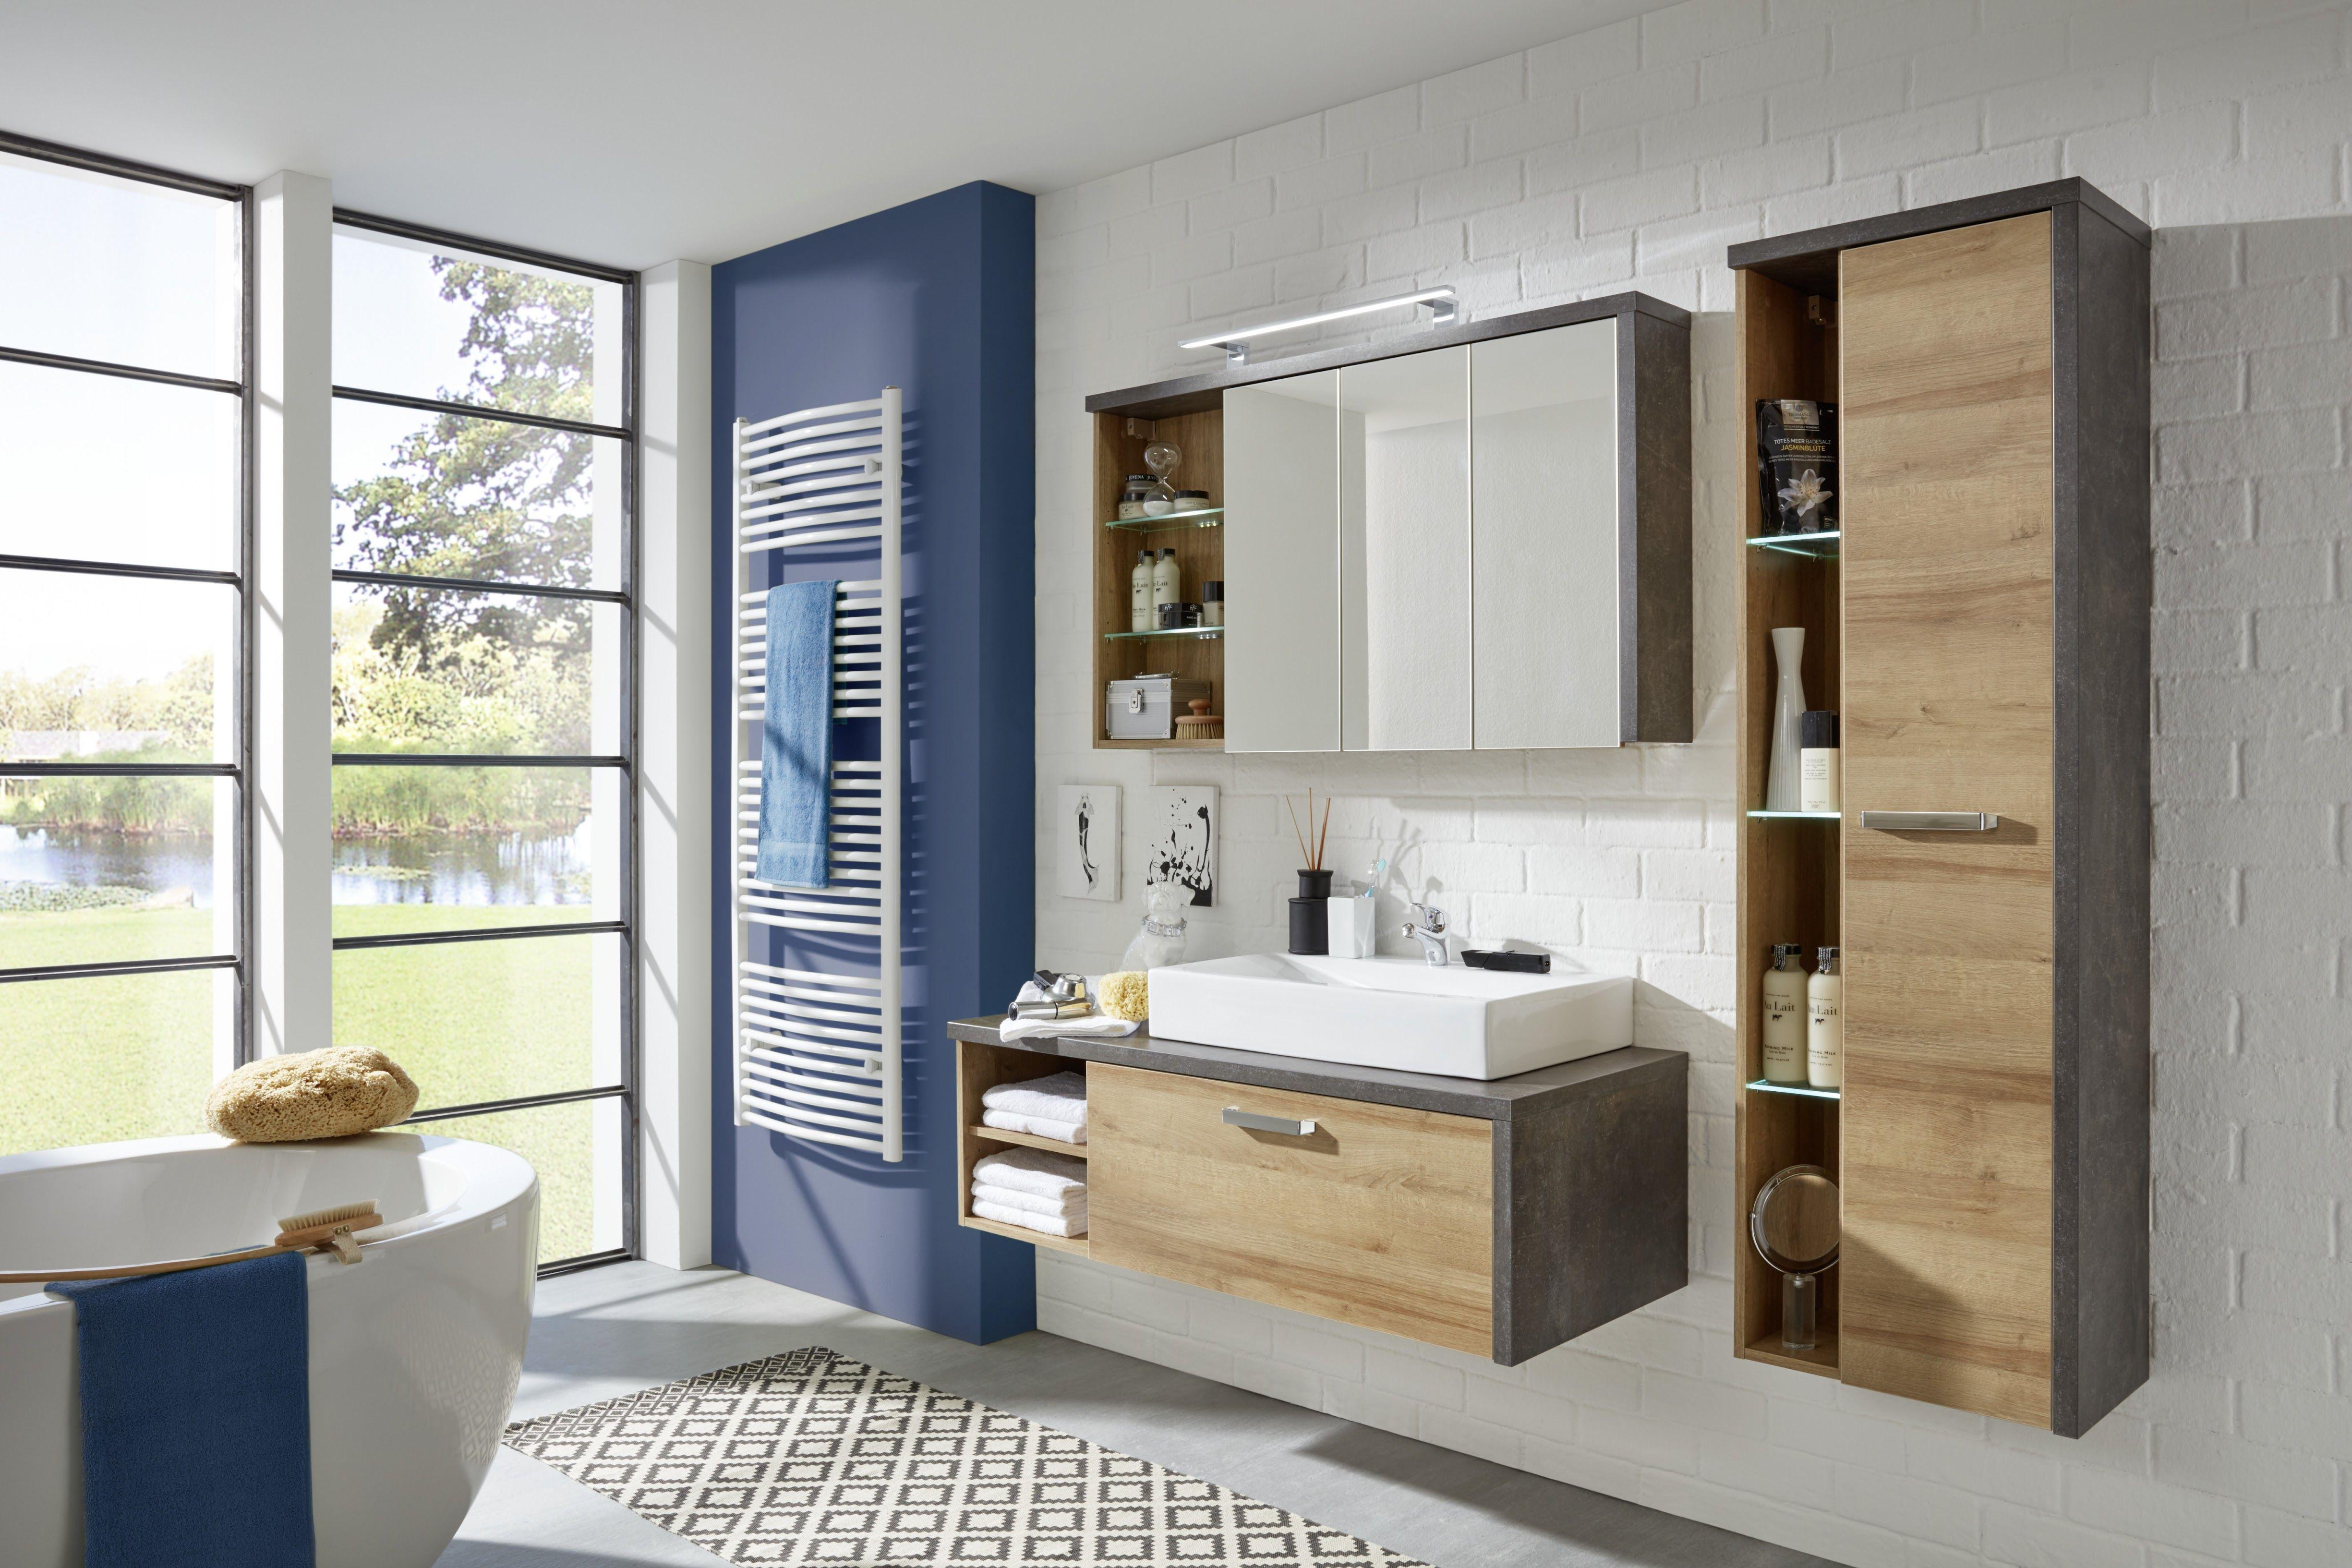 Bad Dunkel badezimmer eiche riviera honig beton dunkel woody 93 01141 holz